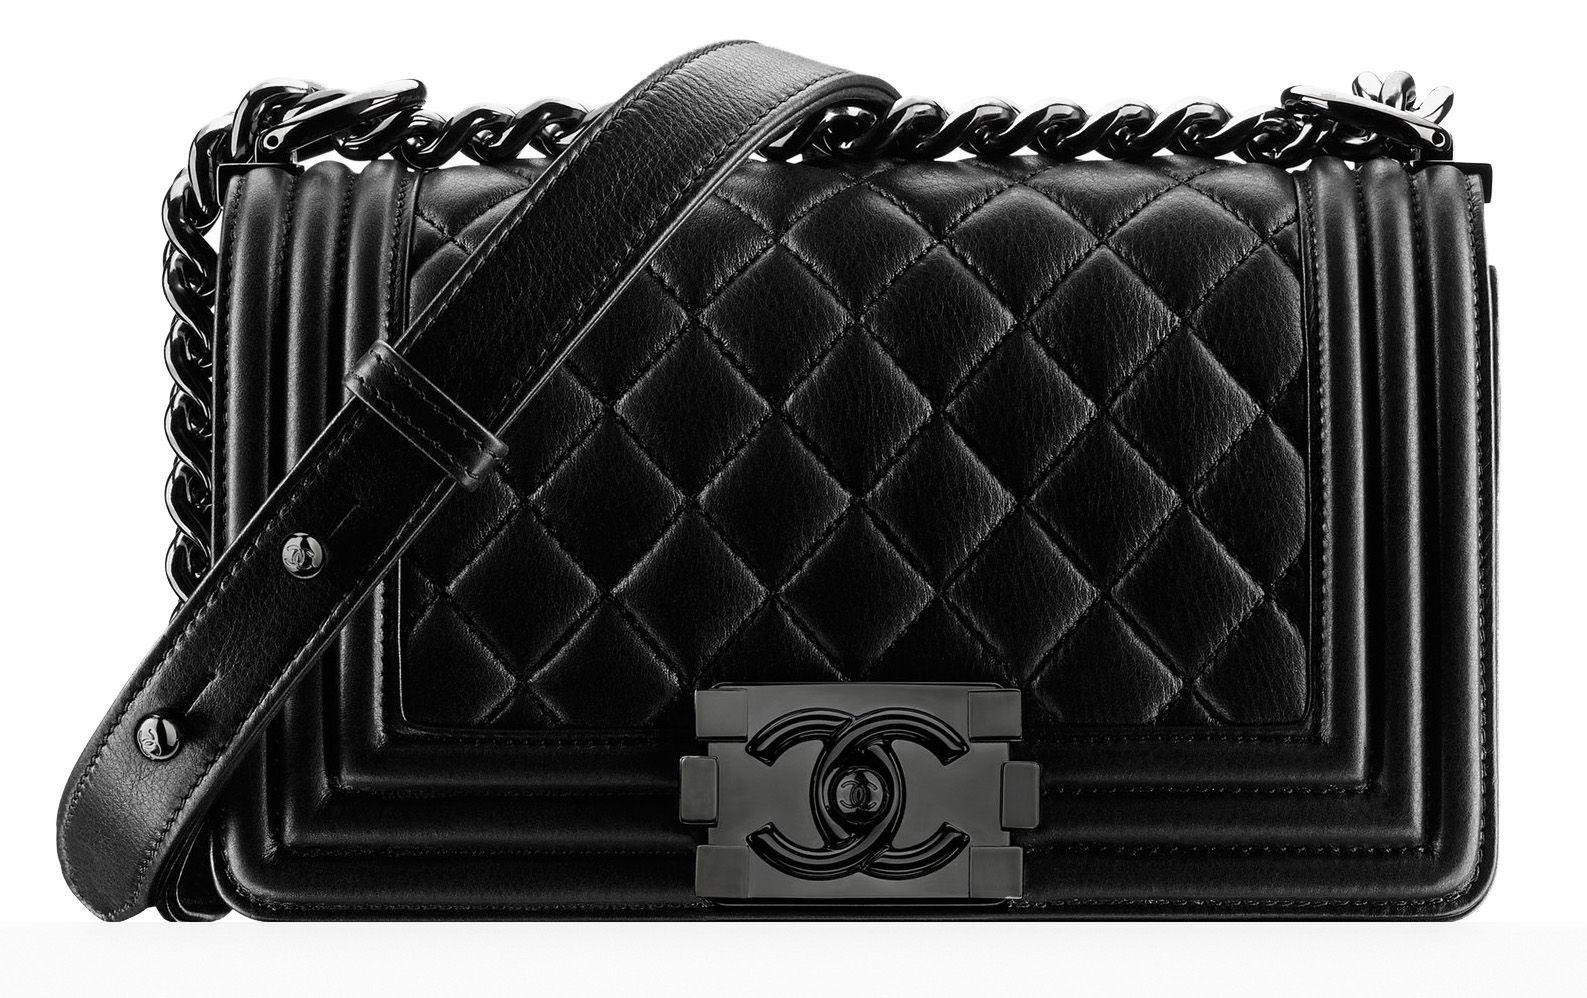 f0ed2f1b9d24 Chanel Small Boy Bag Black | black bags | Chanel spring, Chanel backpack,  Bags